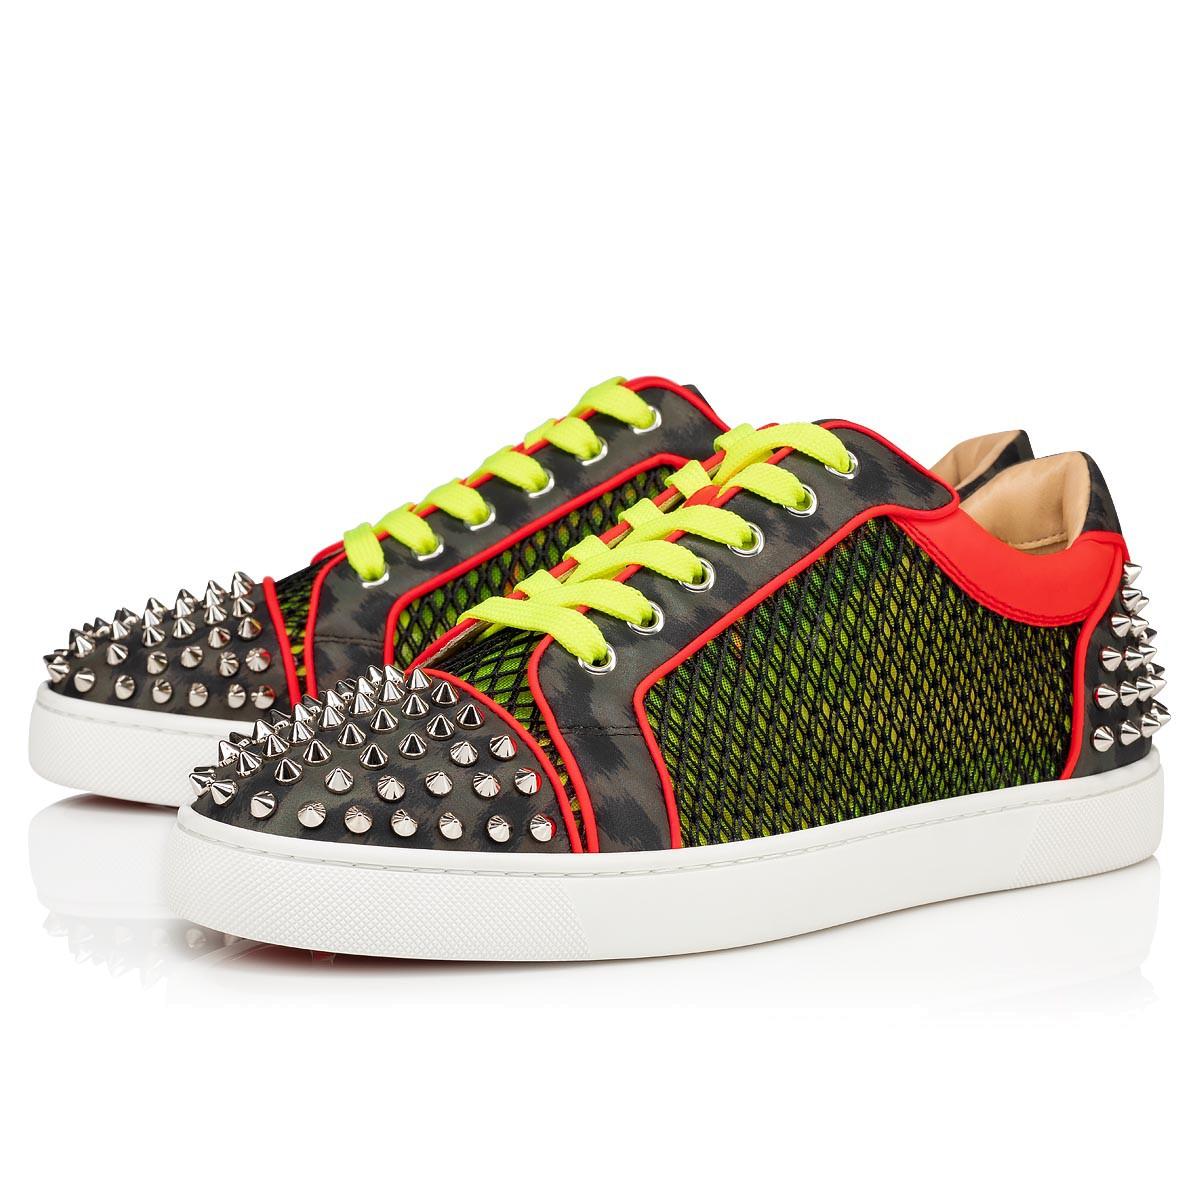 Shoes - Ac Seavaste 2 - Christian Louboutin